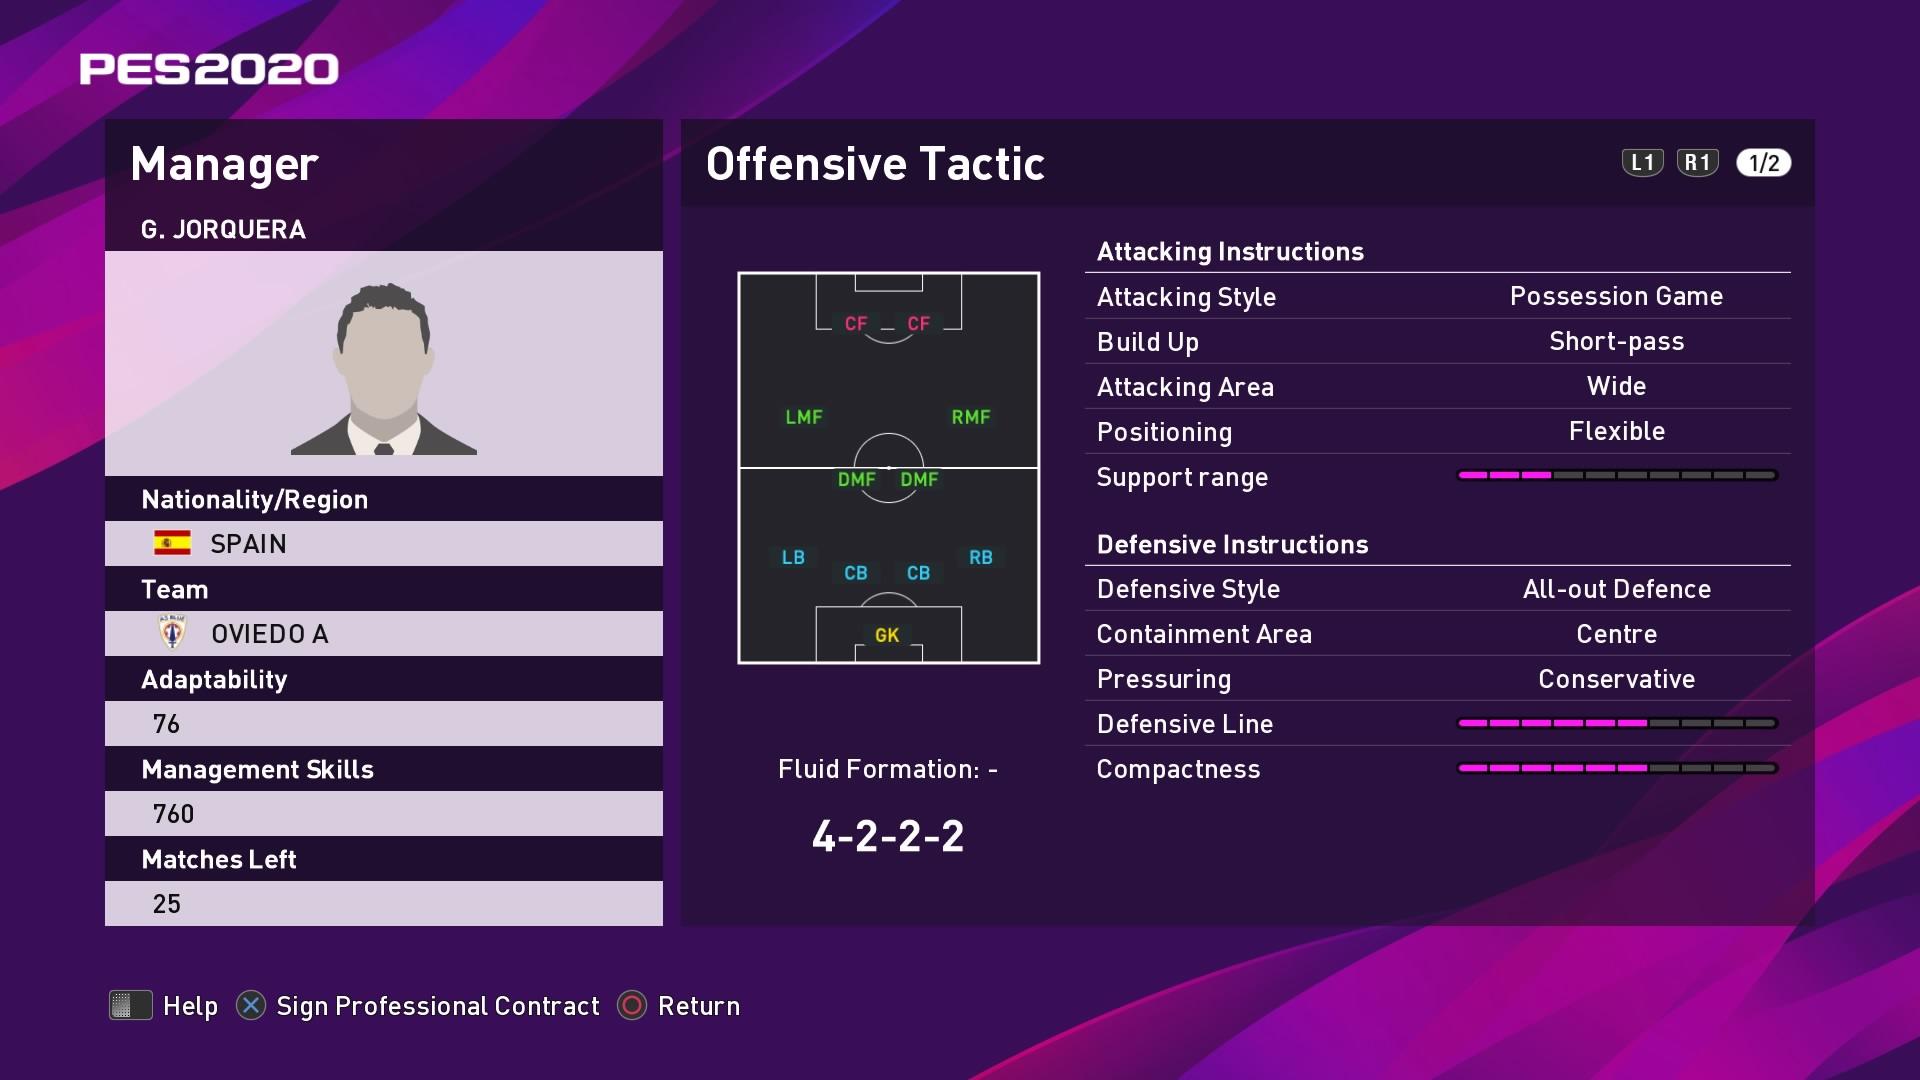 G. Jorquera (José Ángel Ziganda) Offensive Tactic in PES 2020 myClub